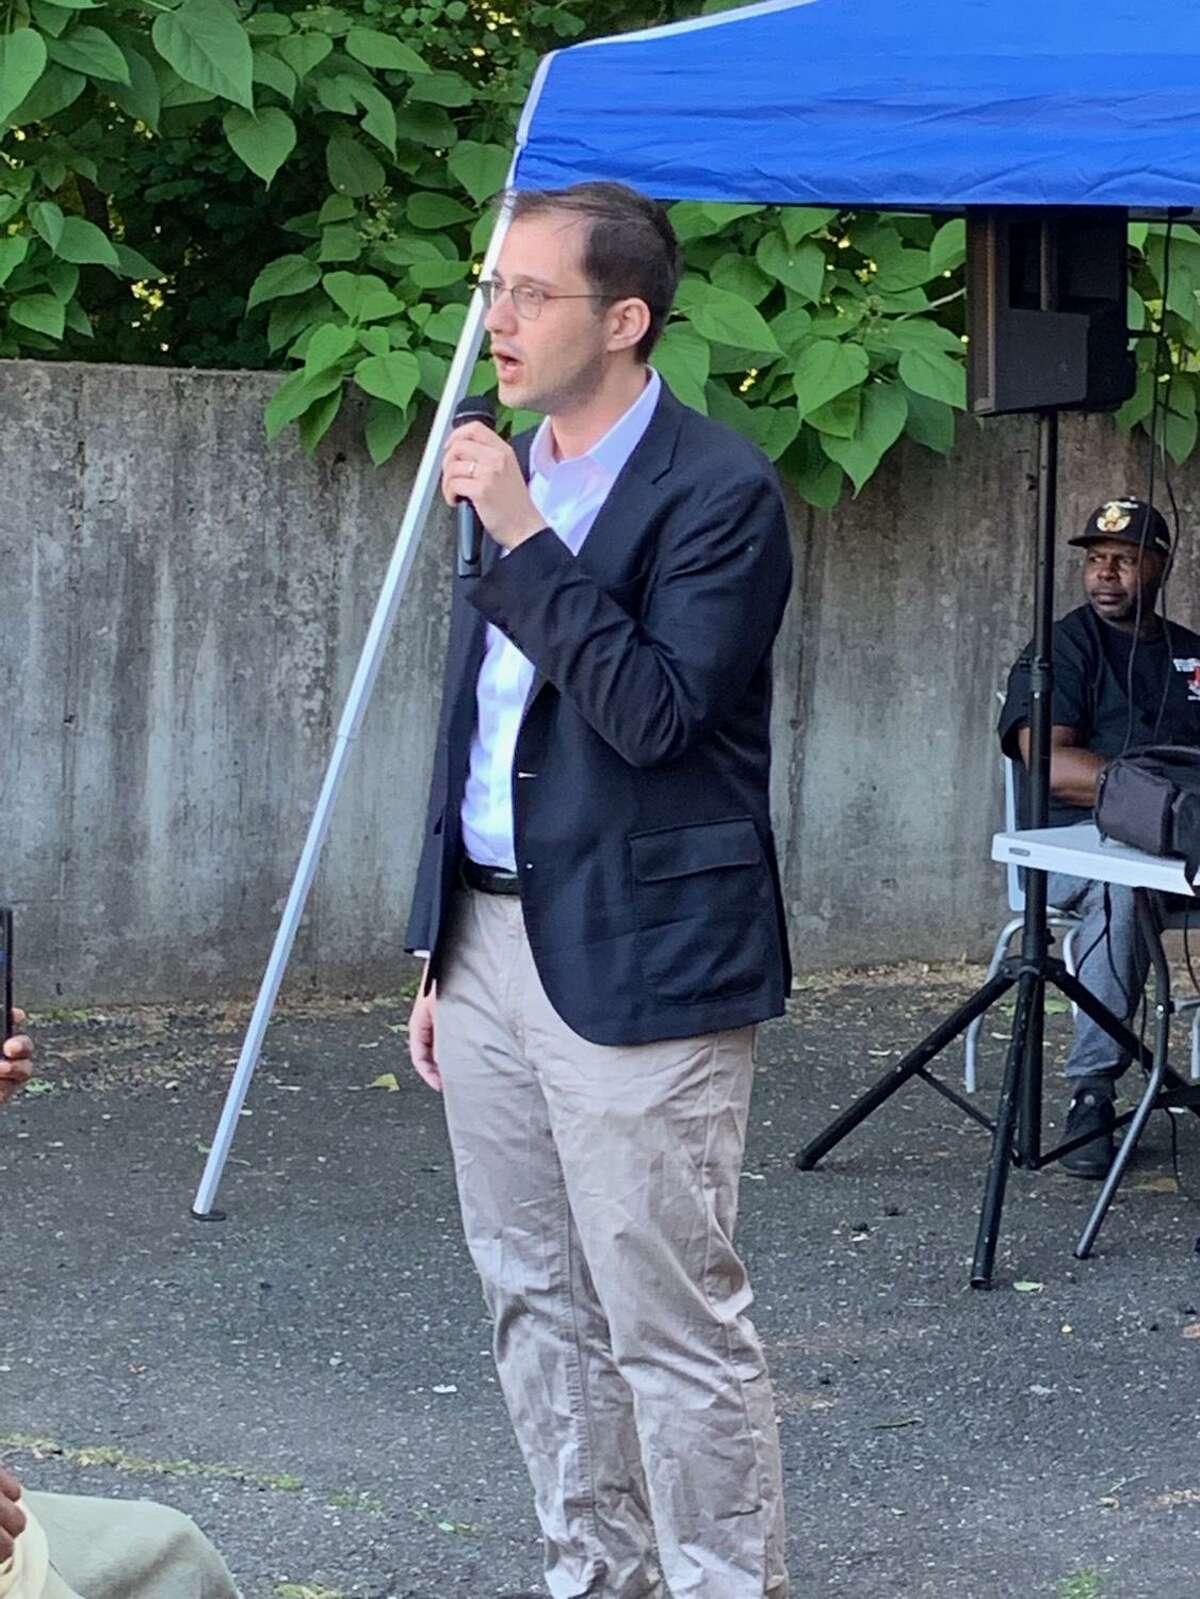 Attorney Alex Taubes supports Mayor Toni Harp